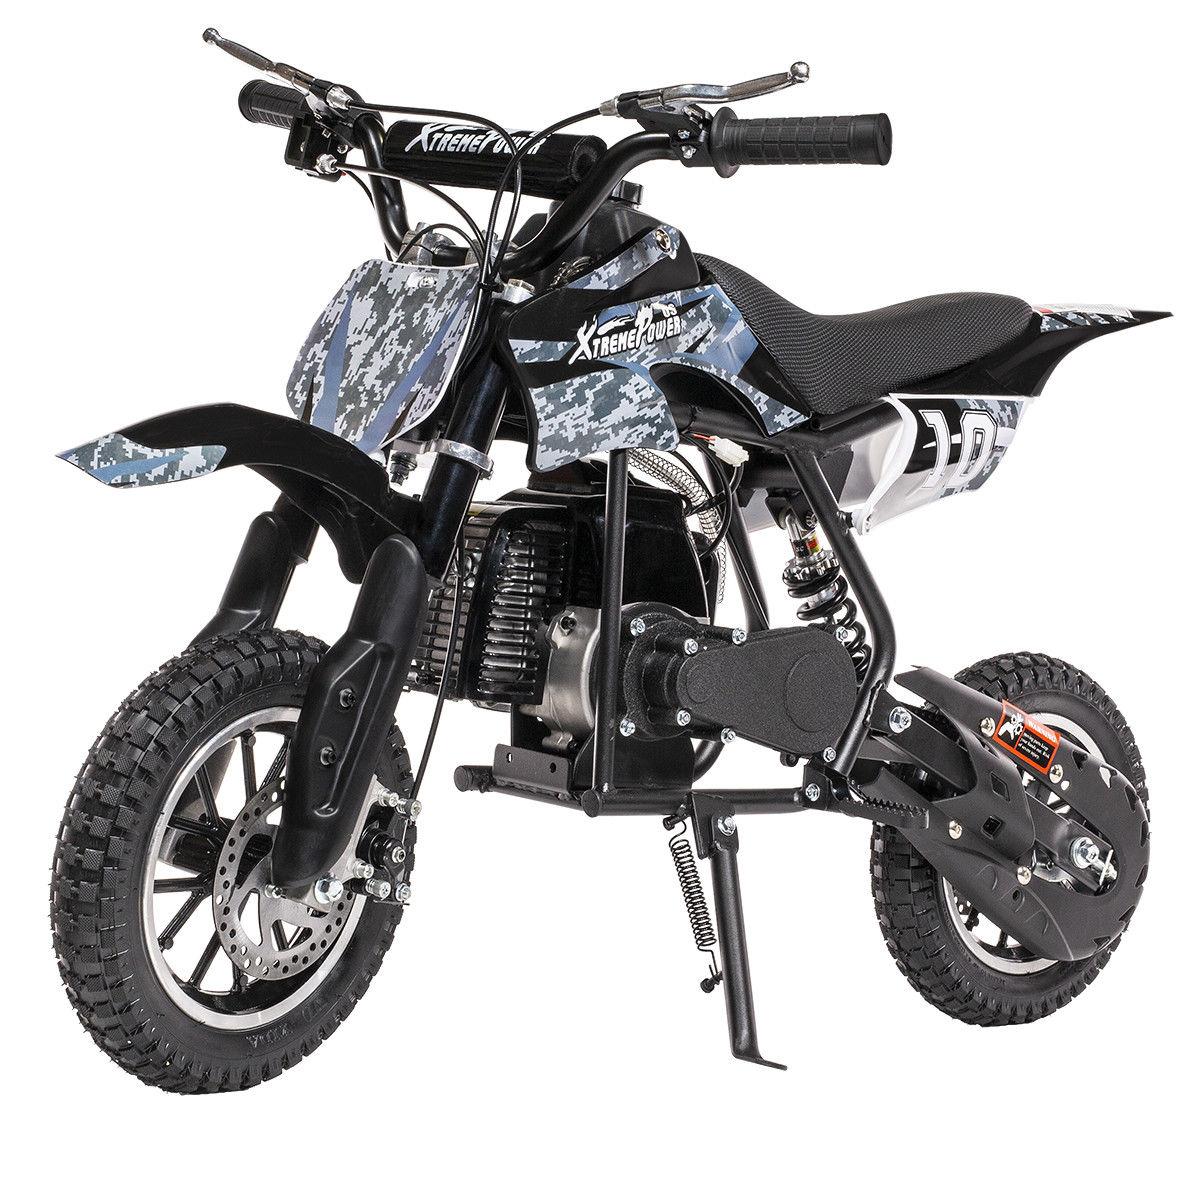 XtremepowerUS-49CC-2-Stroke-Gas-Power-Mini-Pocket-Dirt-Bike-Dirt-Off-Road-Motorc